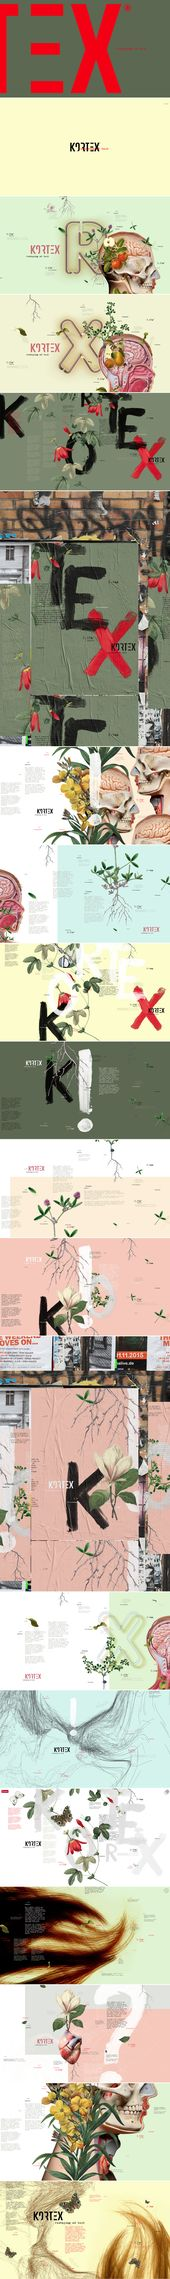 Kortex – Identidad visual   – inspiracion